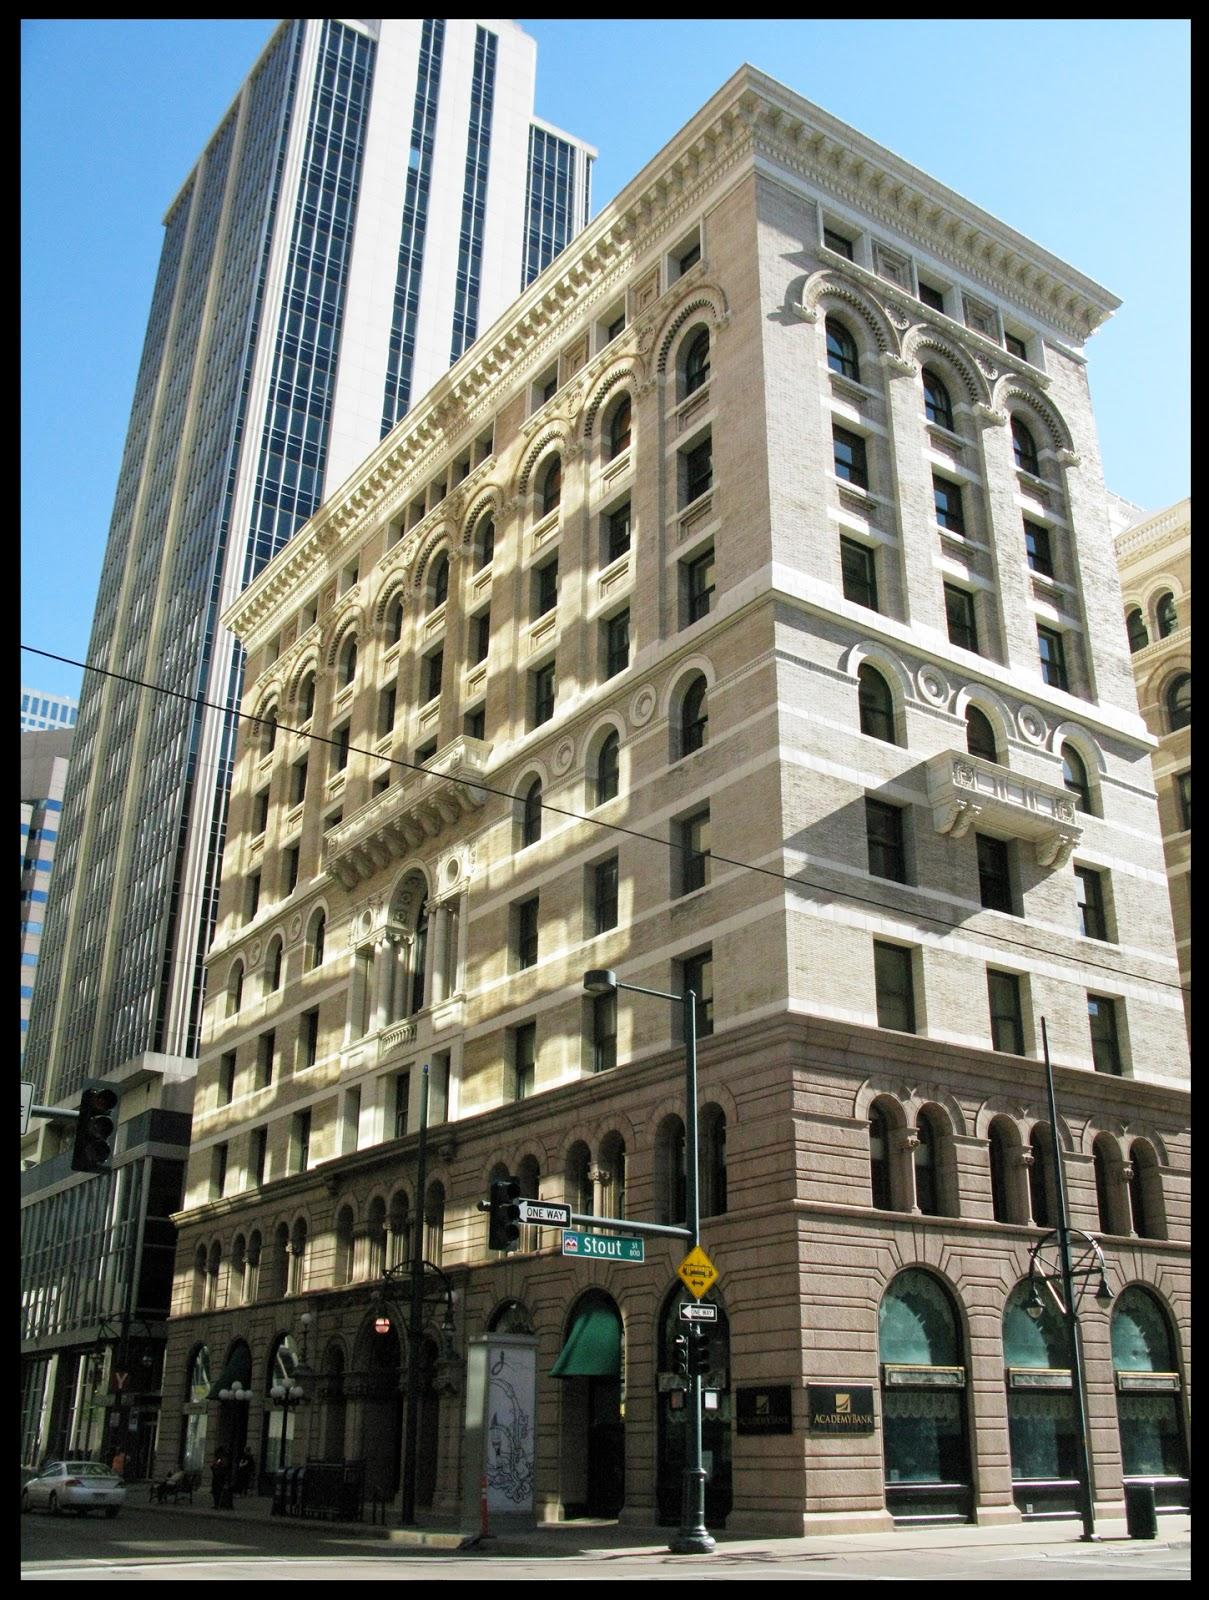 David Hoyt's Blog: Doors Open Denver - The Equitable Building